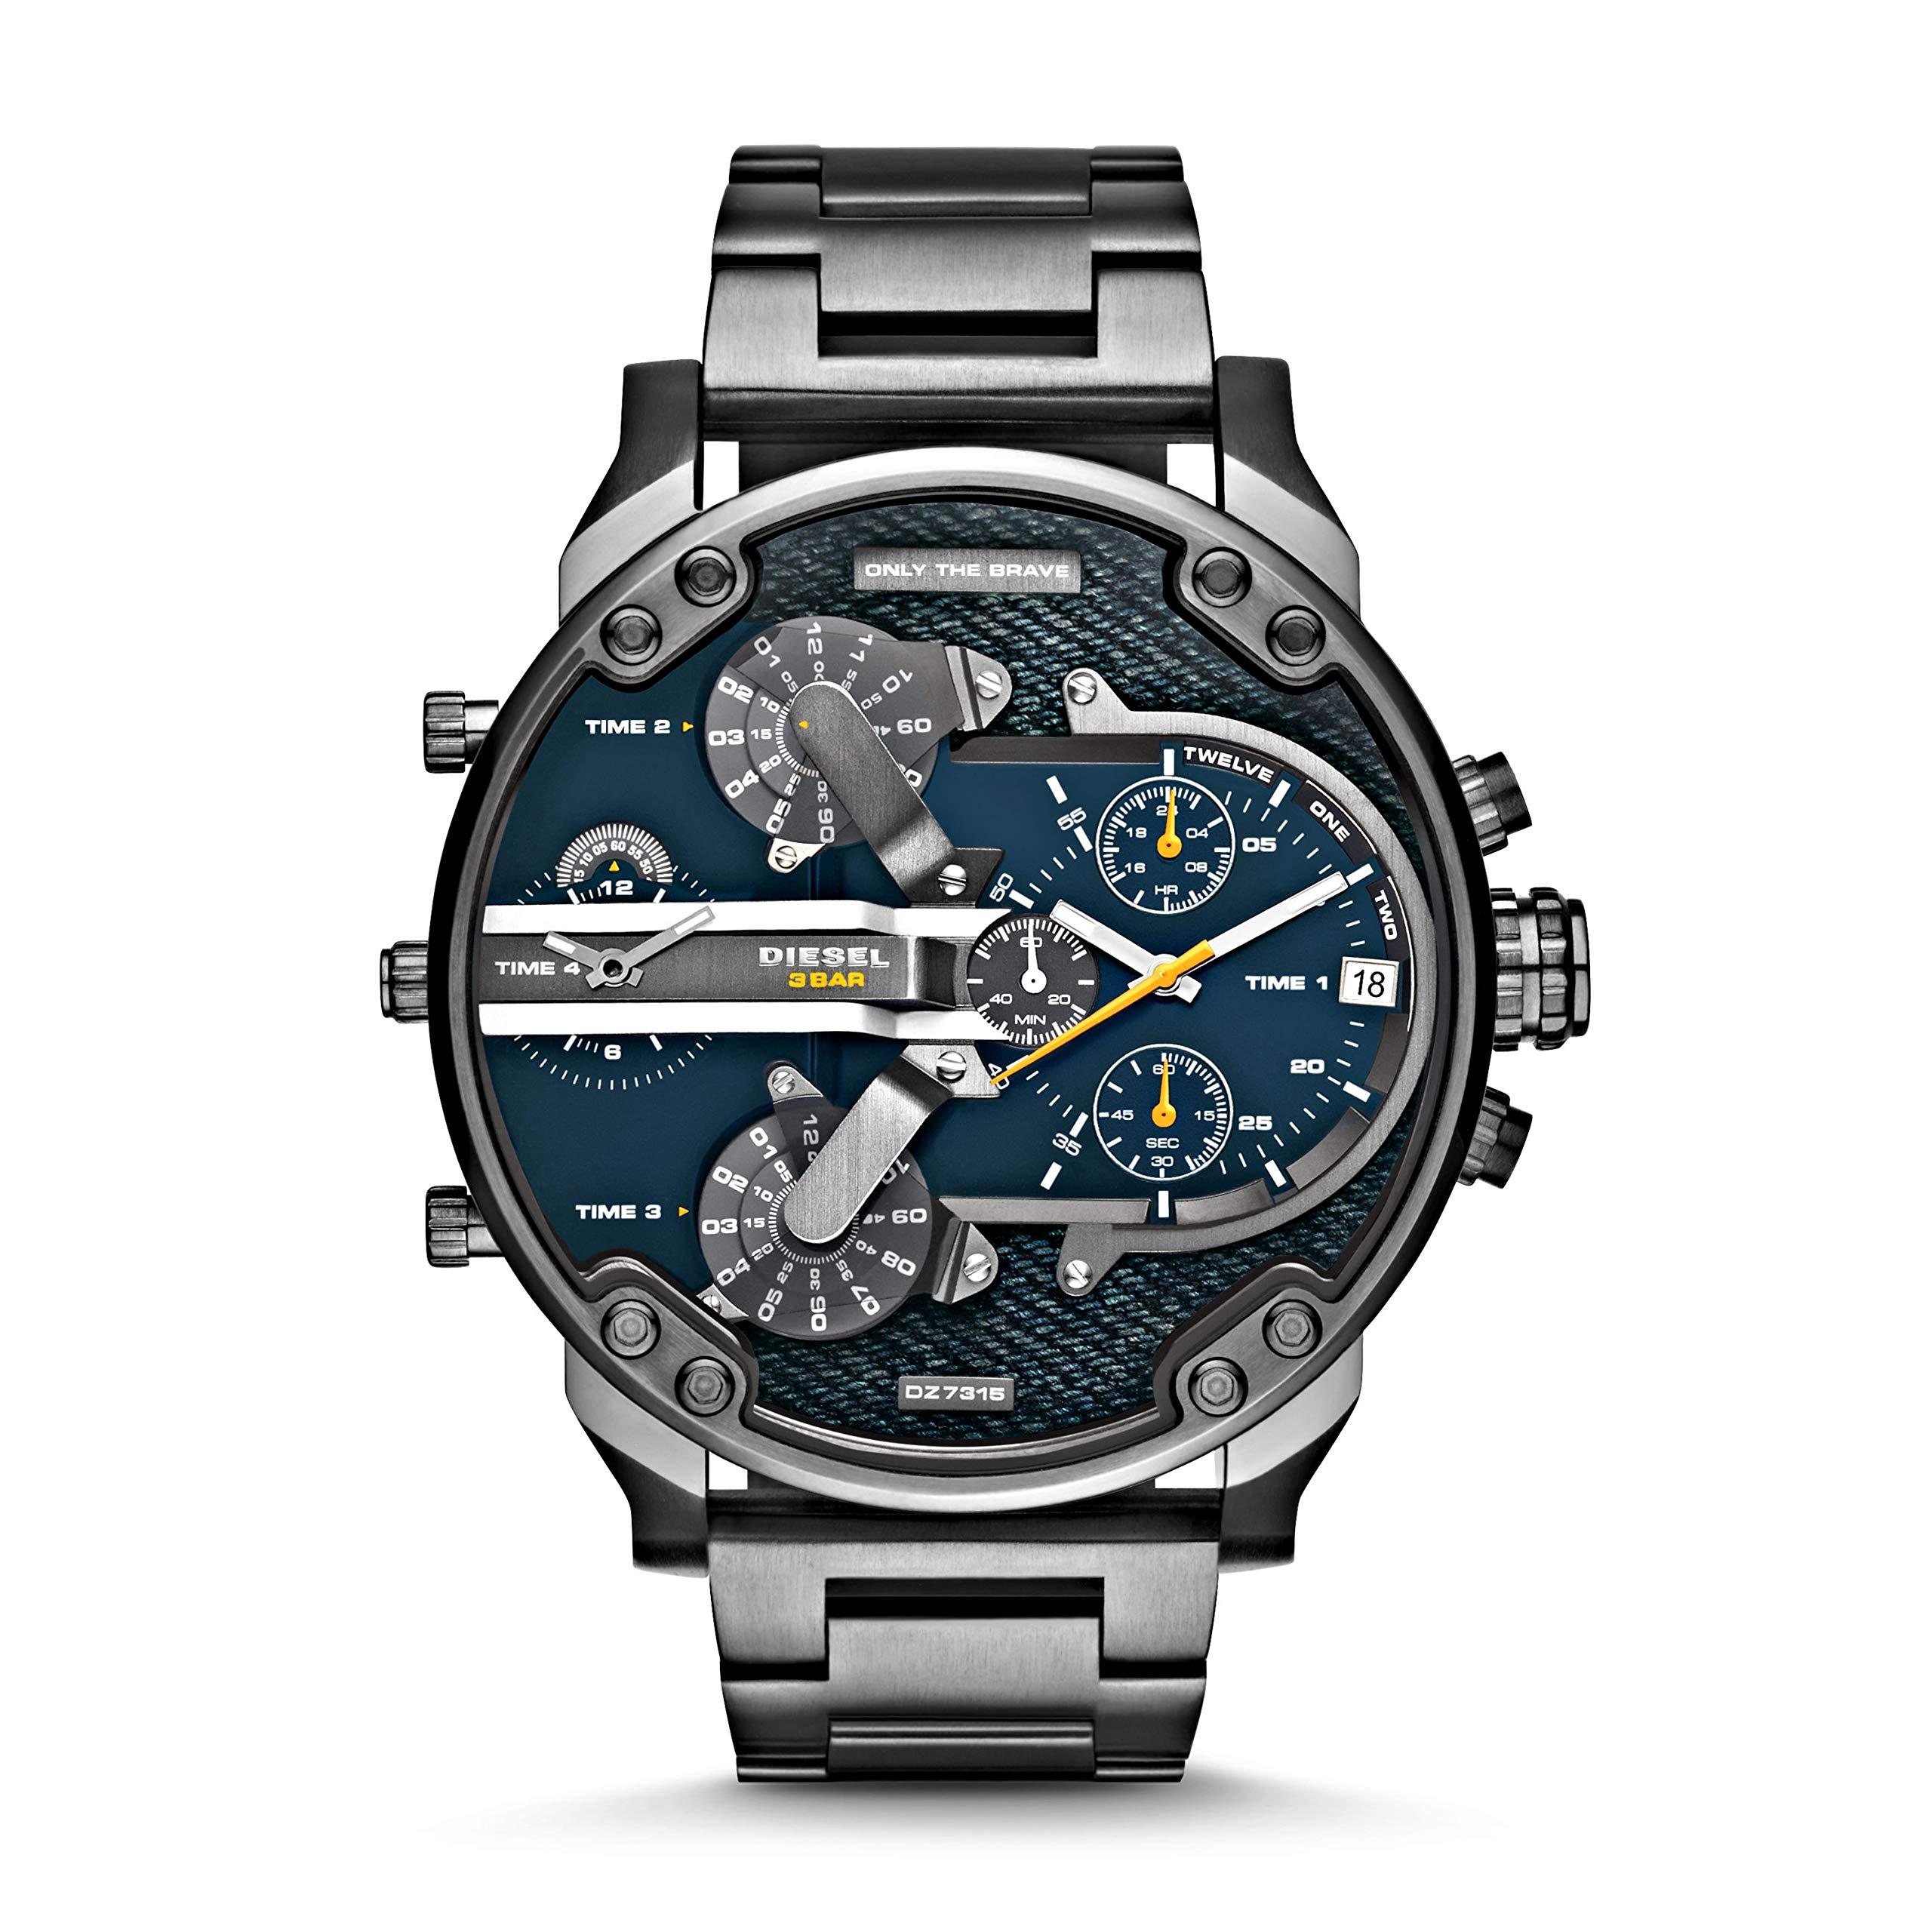 Diesel Men's DZ7331 Mr Daddy 2.0 Gunmetal-Tone Stainless Steel Watch by Diesel